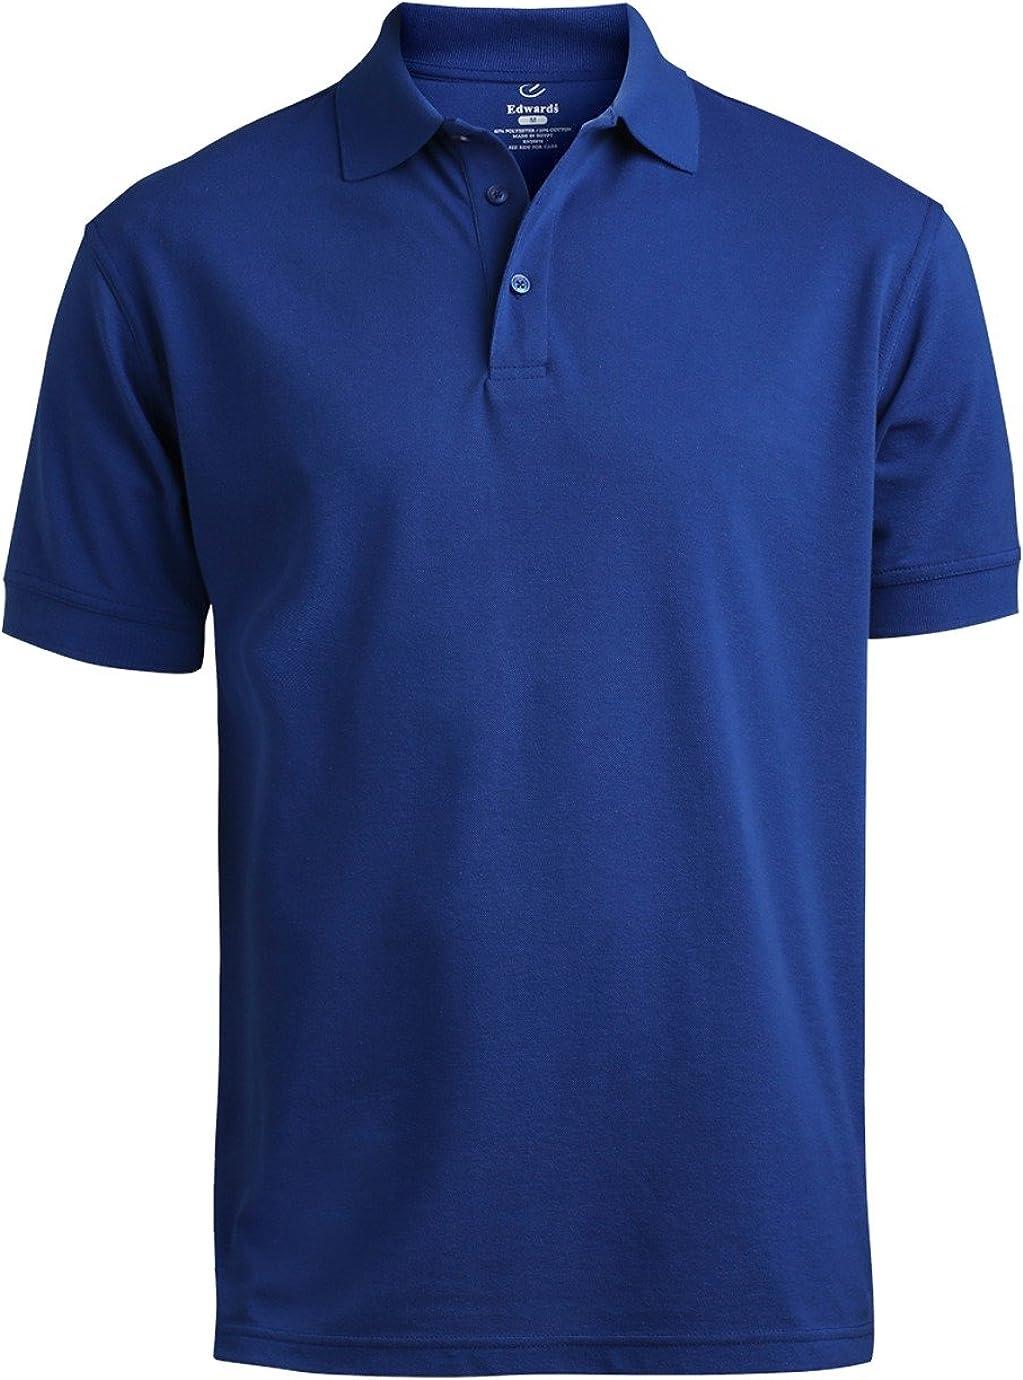 Ed Garments Men's Soft Pique Polo Shirt, ROYAL, XXXXX-Large Tall